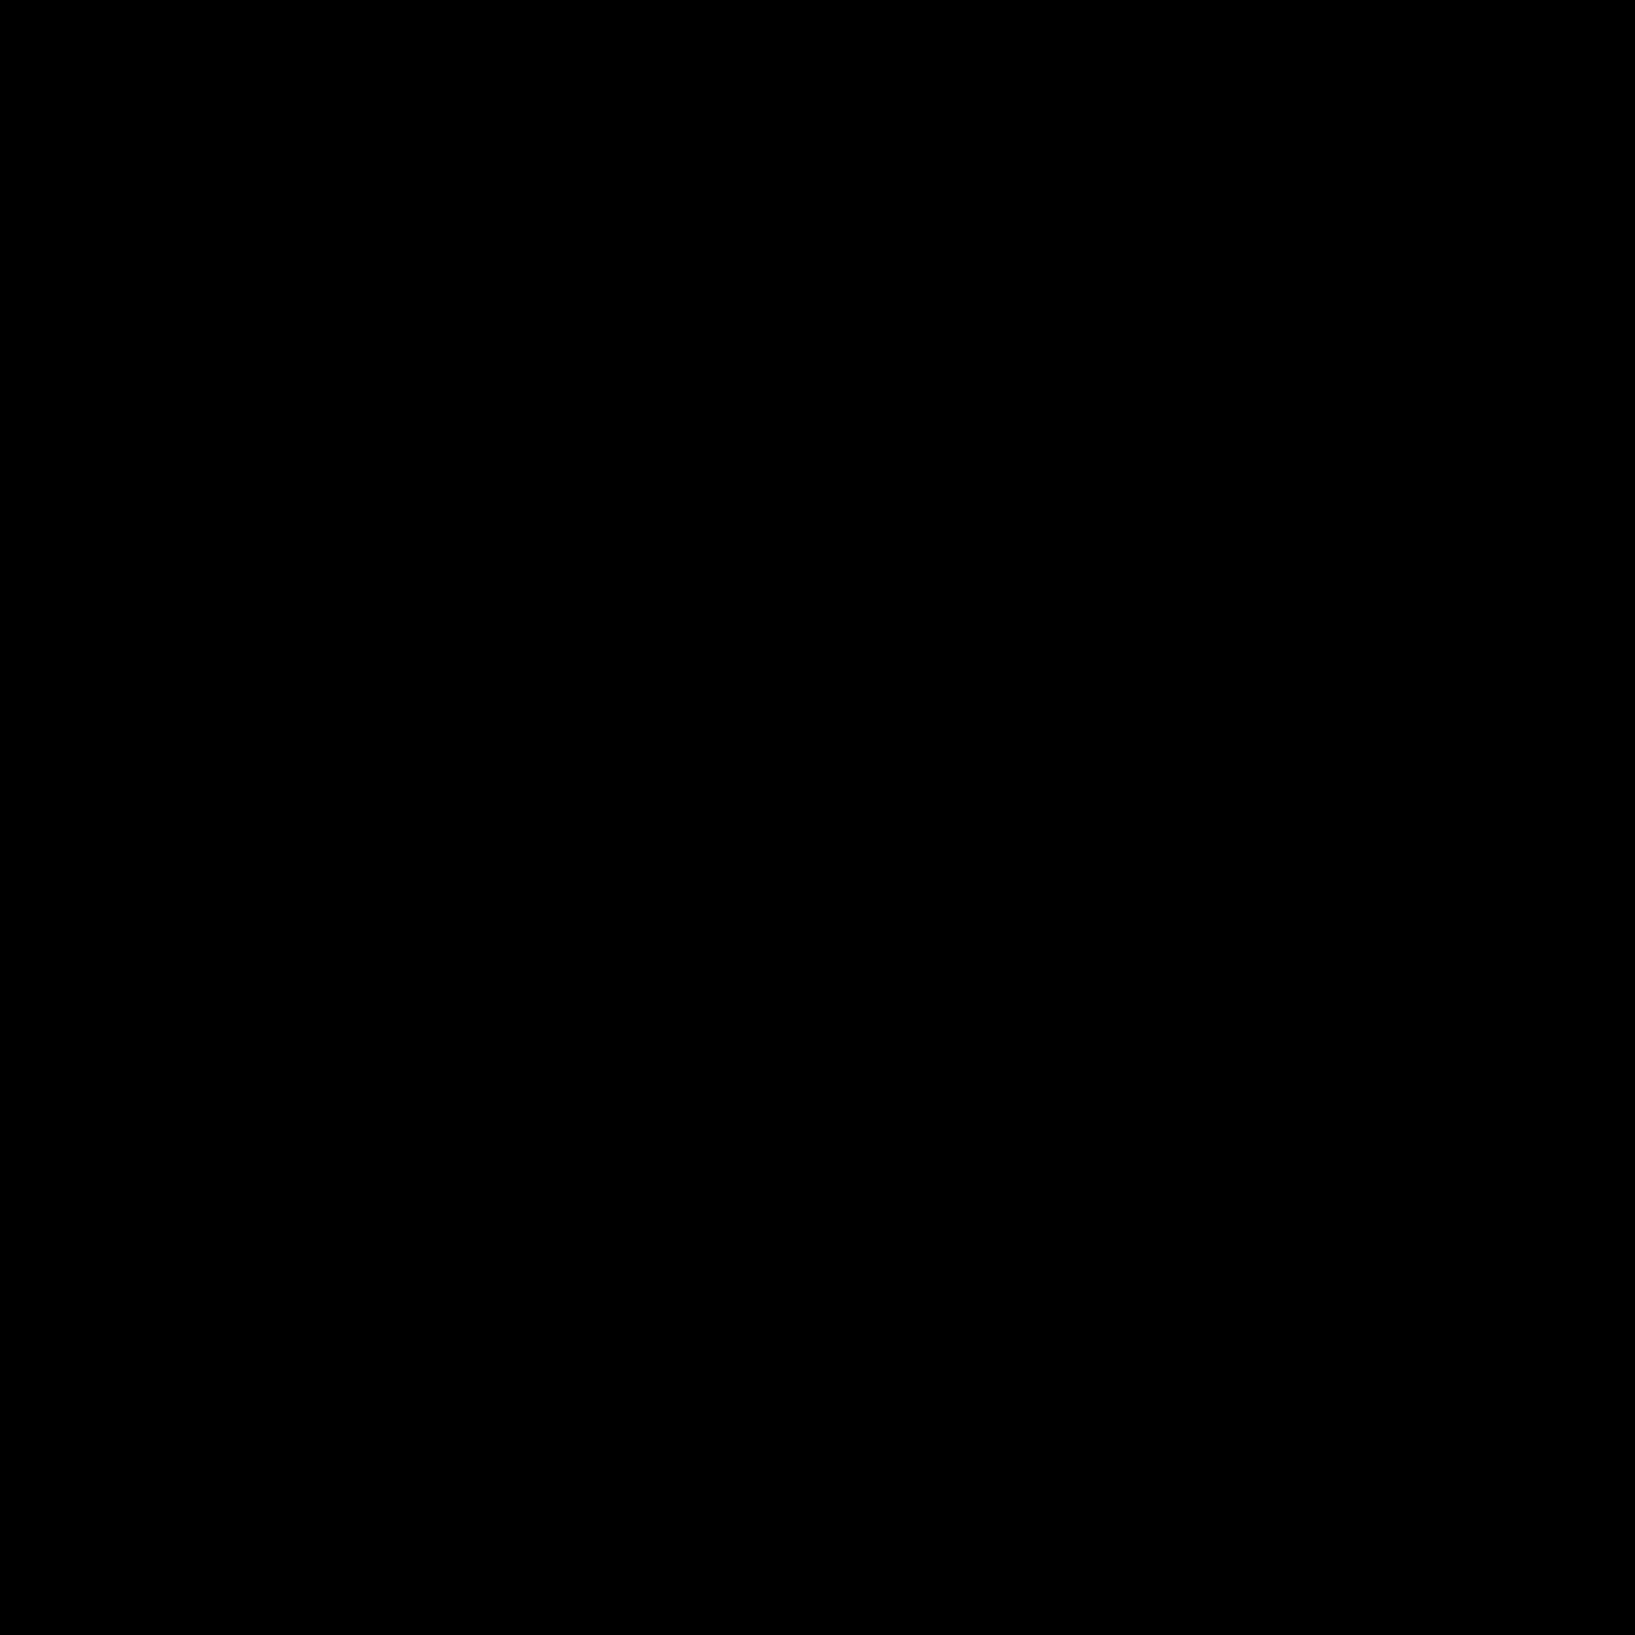 Gustavianischer Klapptisch um 1850